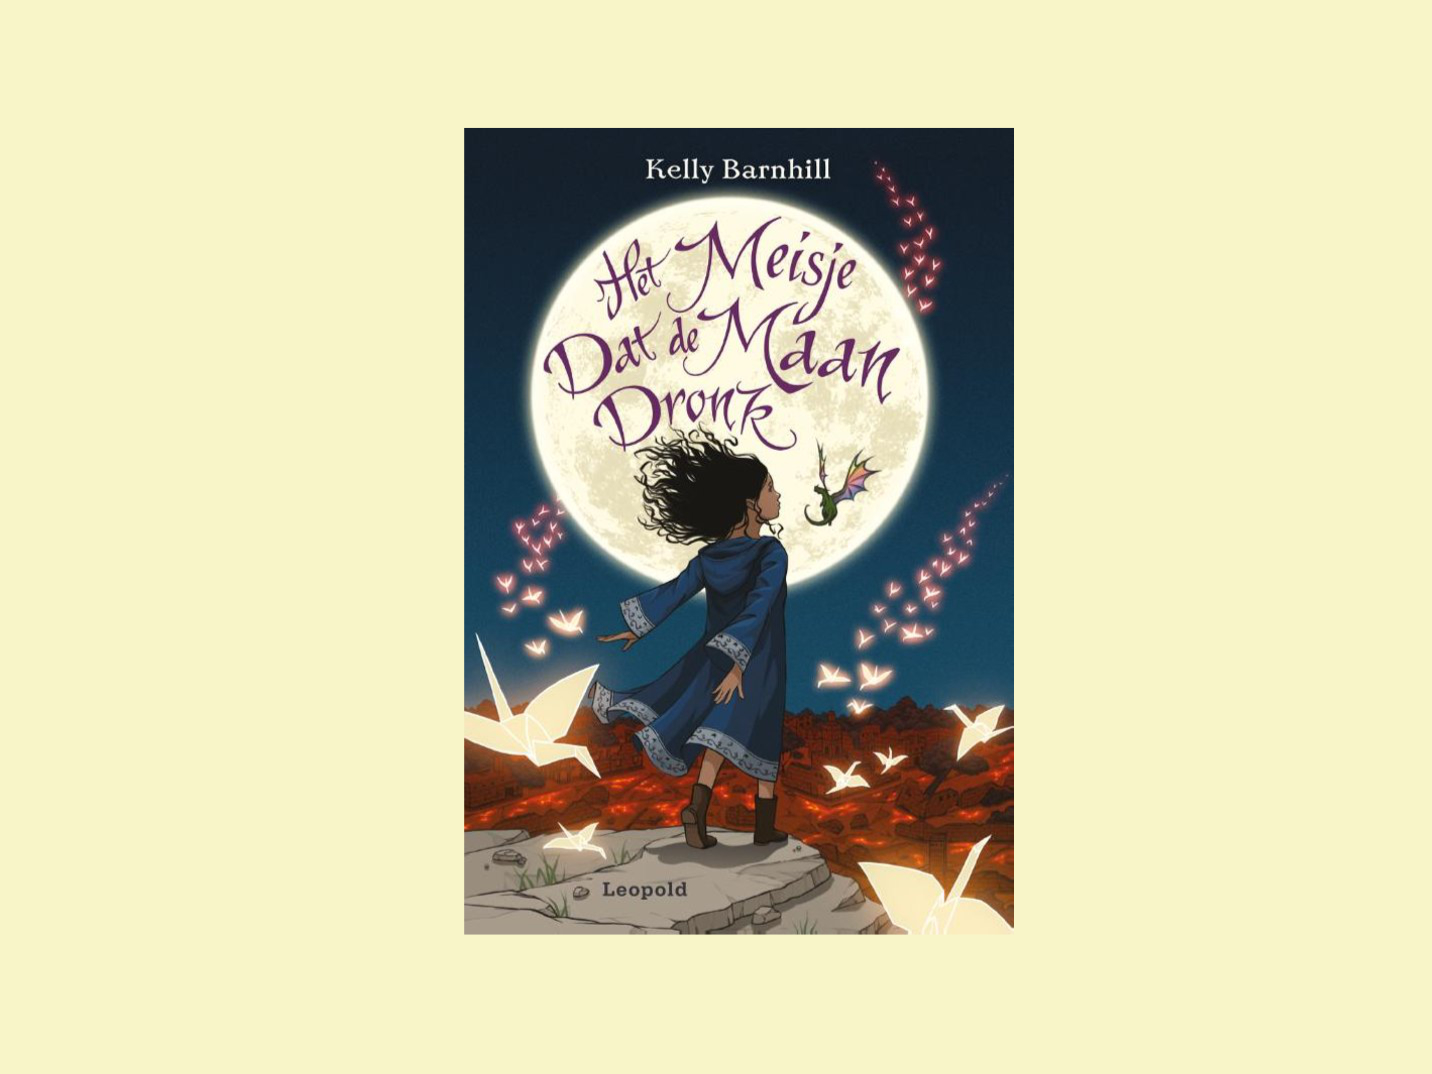 Boekbespreking Het meisje dat de maan dronk